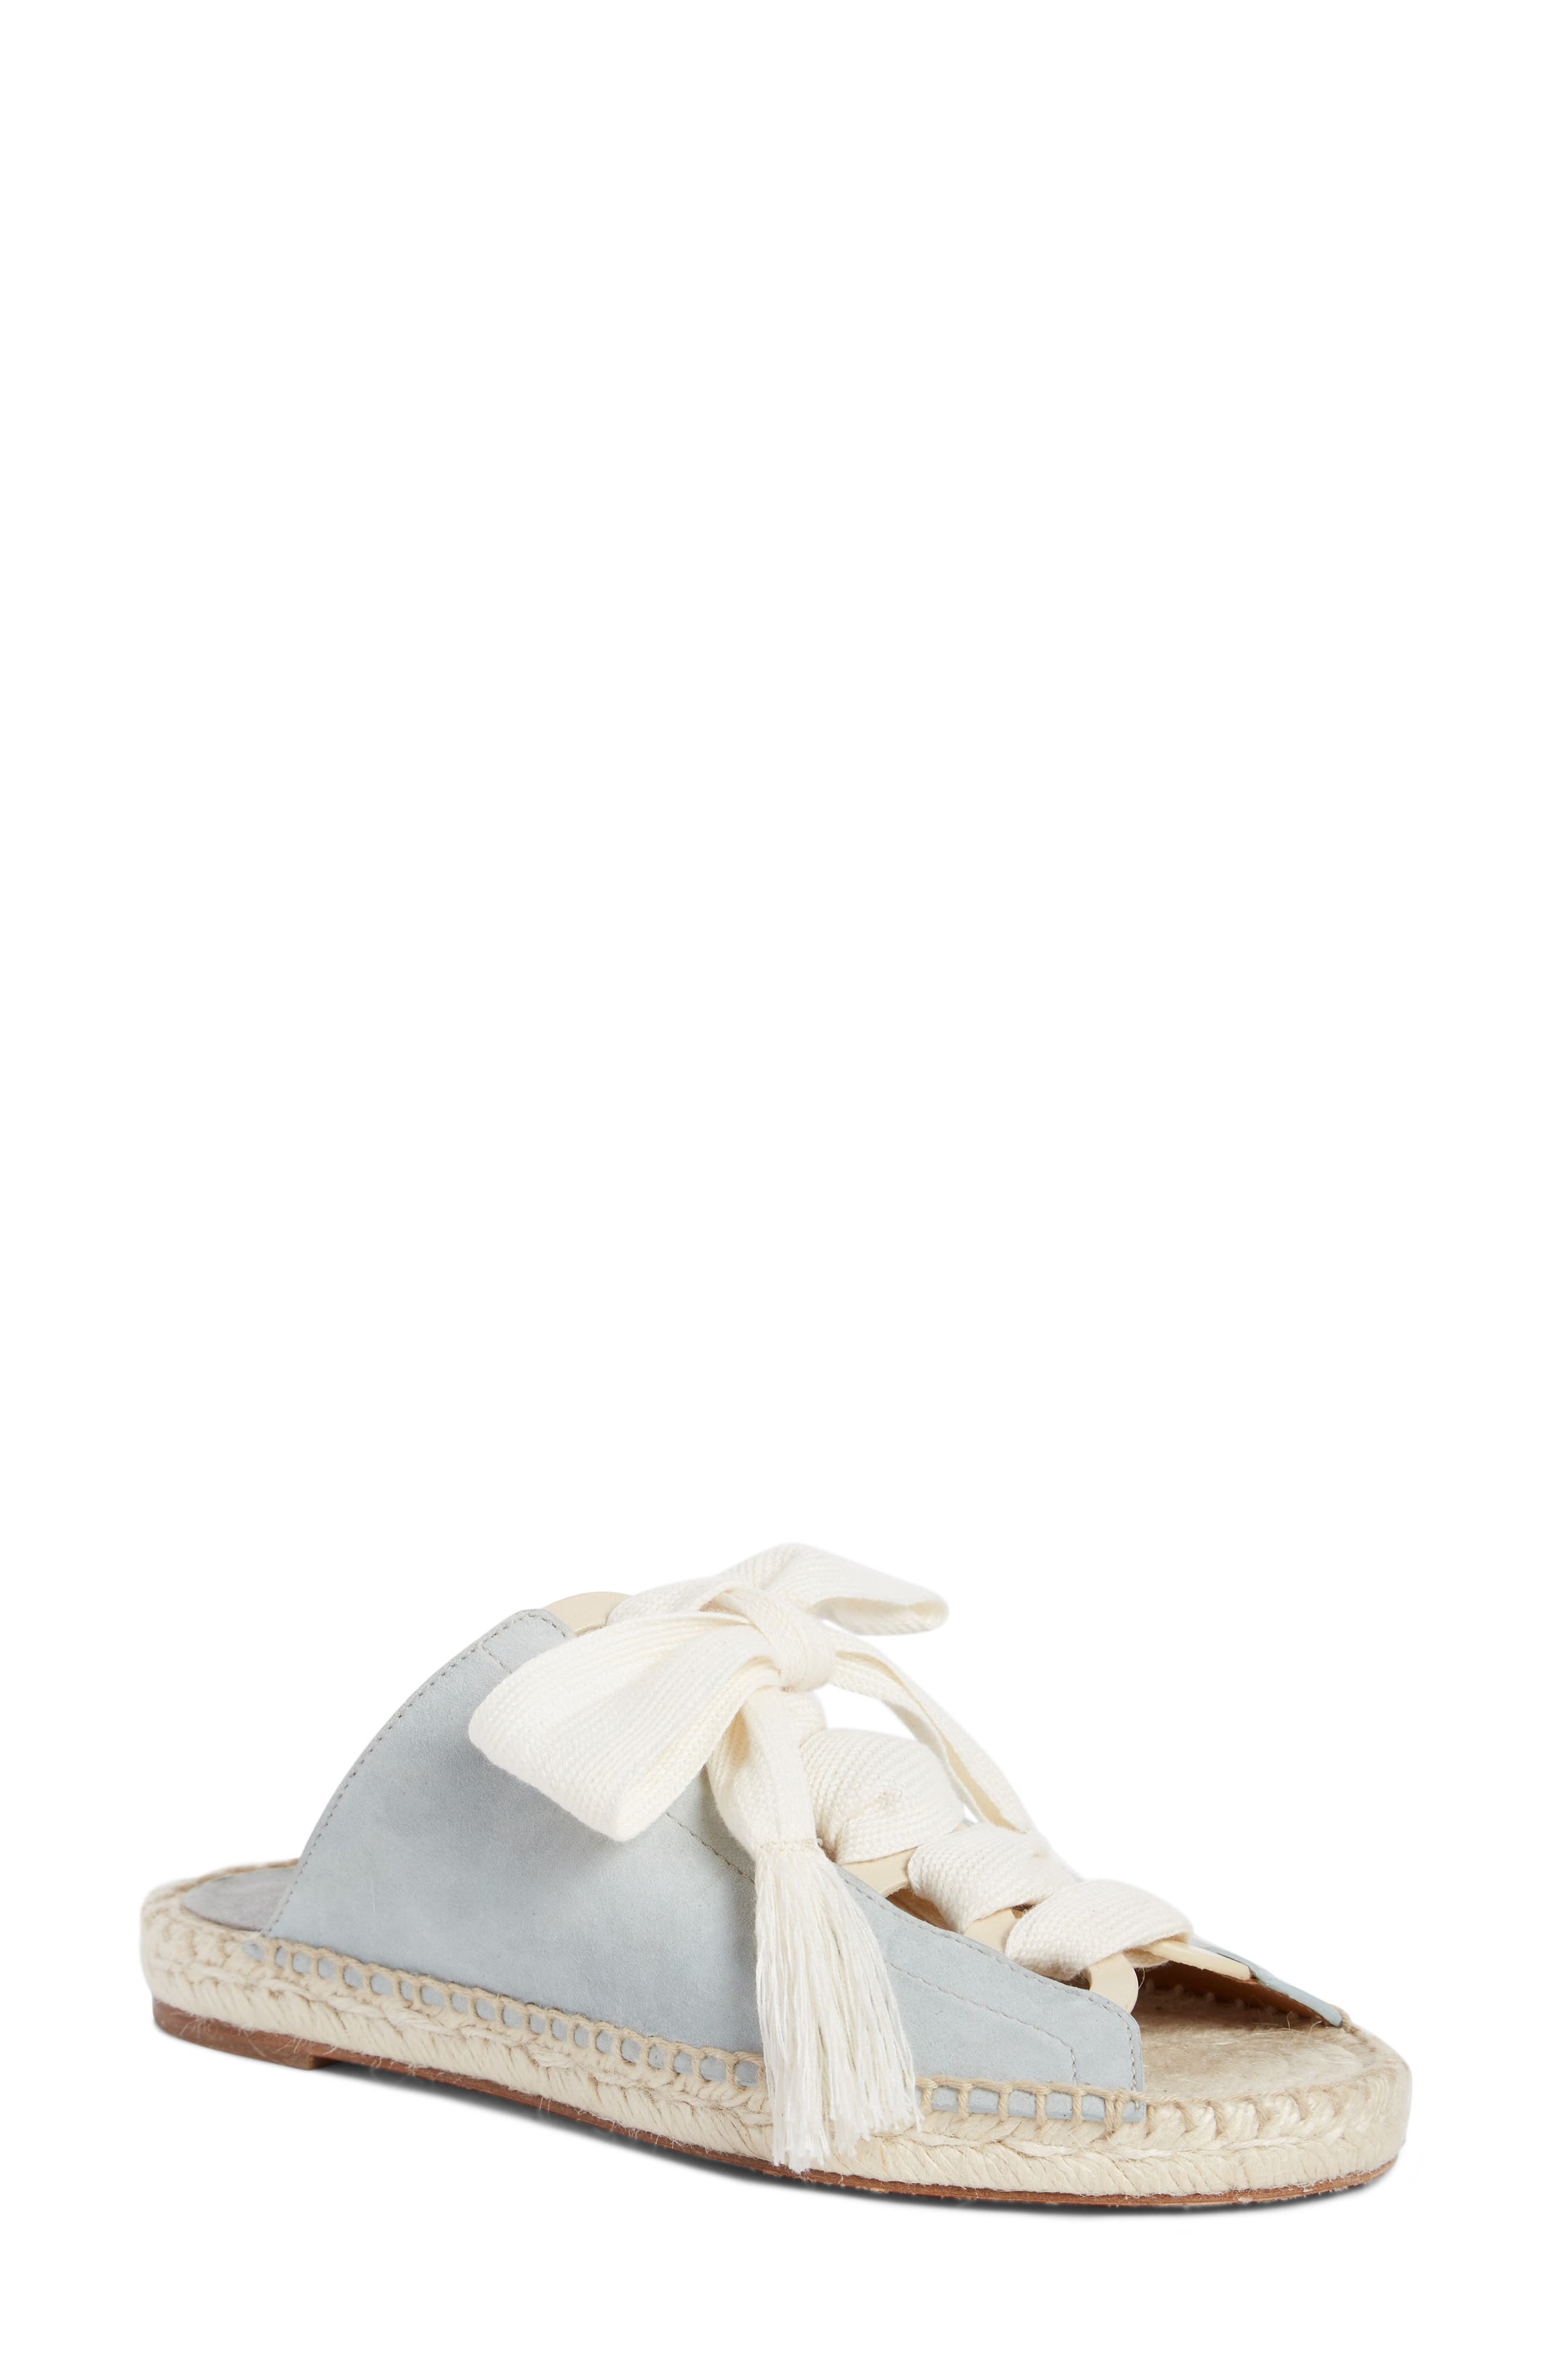 Alternate Image 1 Selected - Chloé Harper Lace-Up Espadrille Slide Sandal (Women)